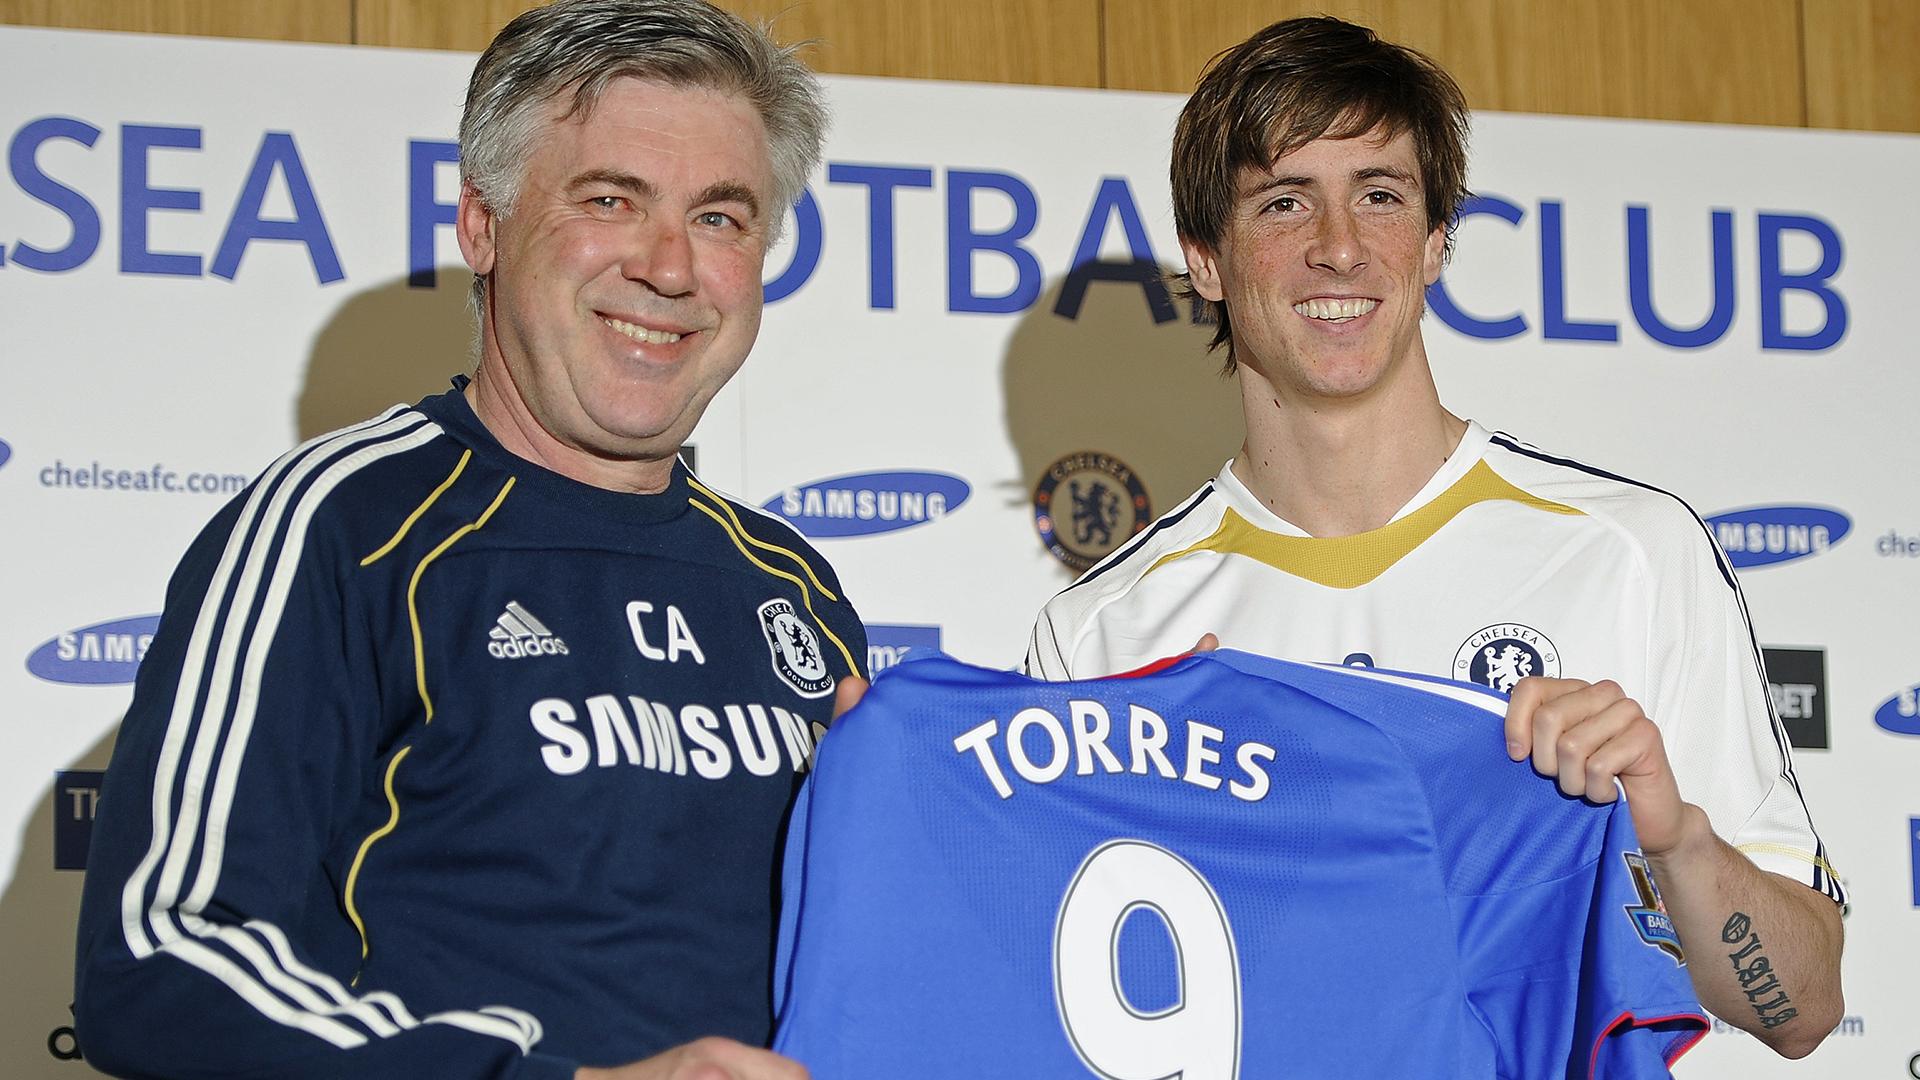 Fernando Torres presentation Chelsea